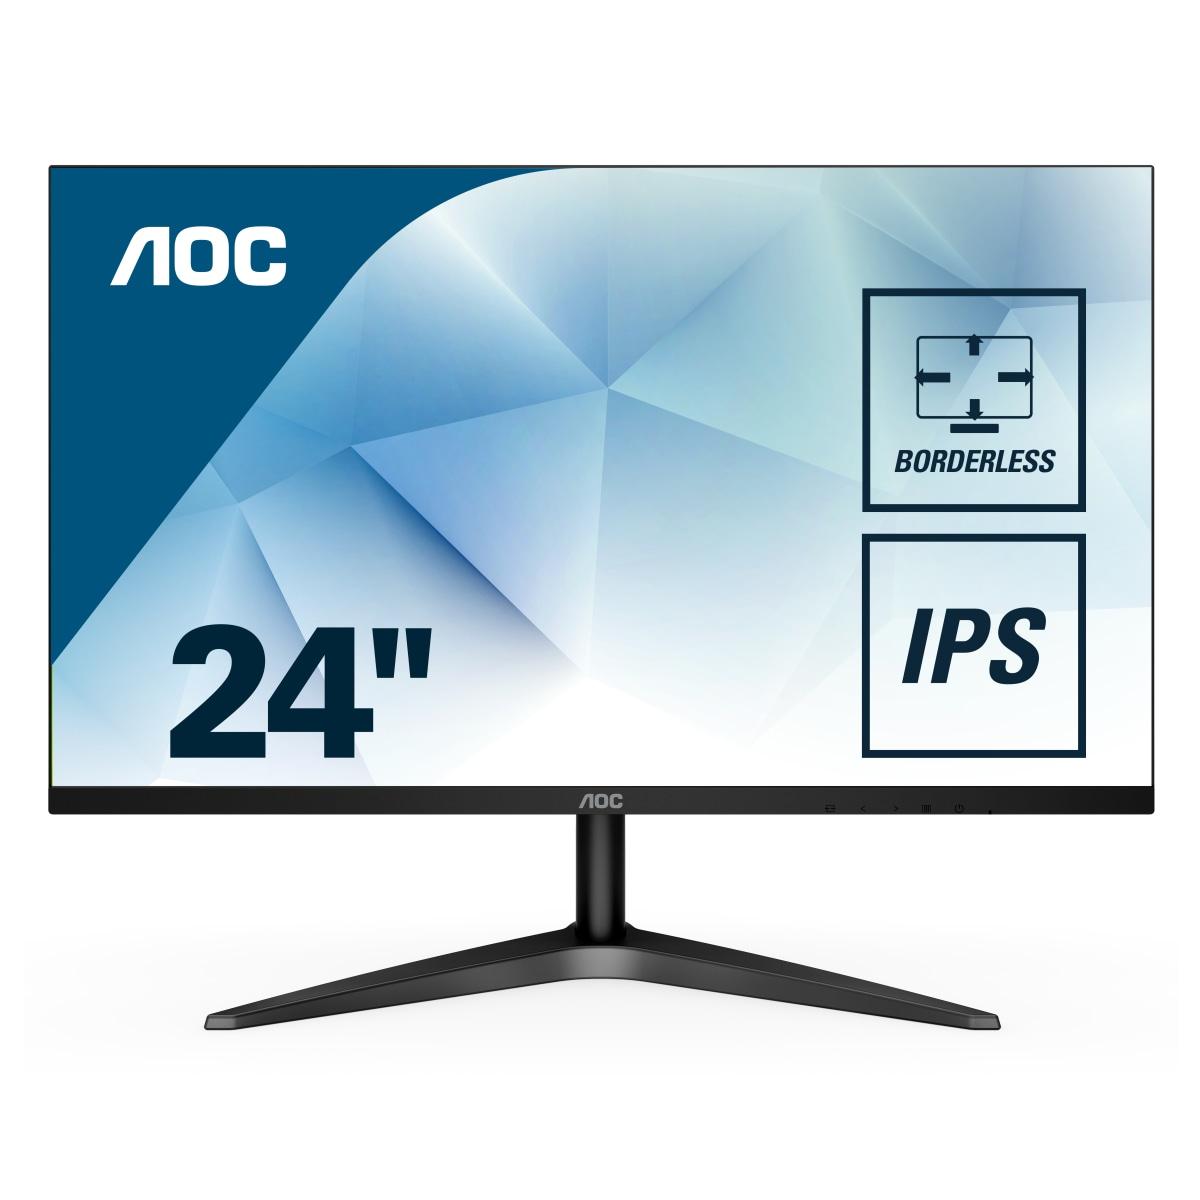 Desktop Monitor - 24B1XHS - 23.8in - 1920x1080 (Full HD) - 7ms